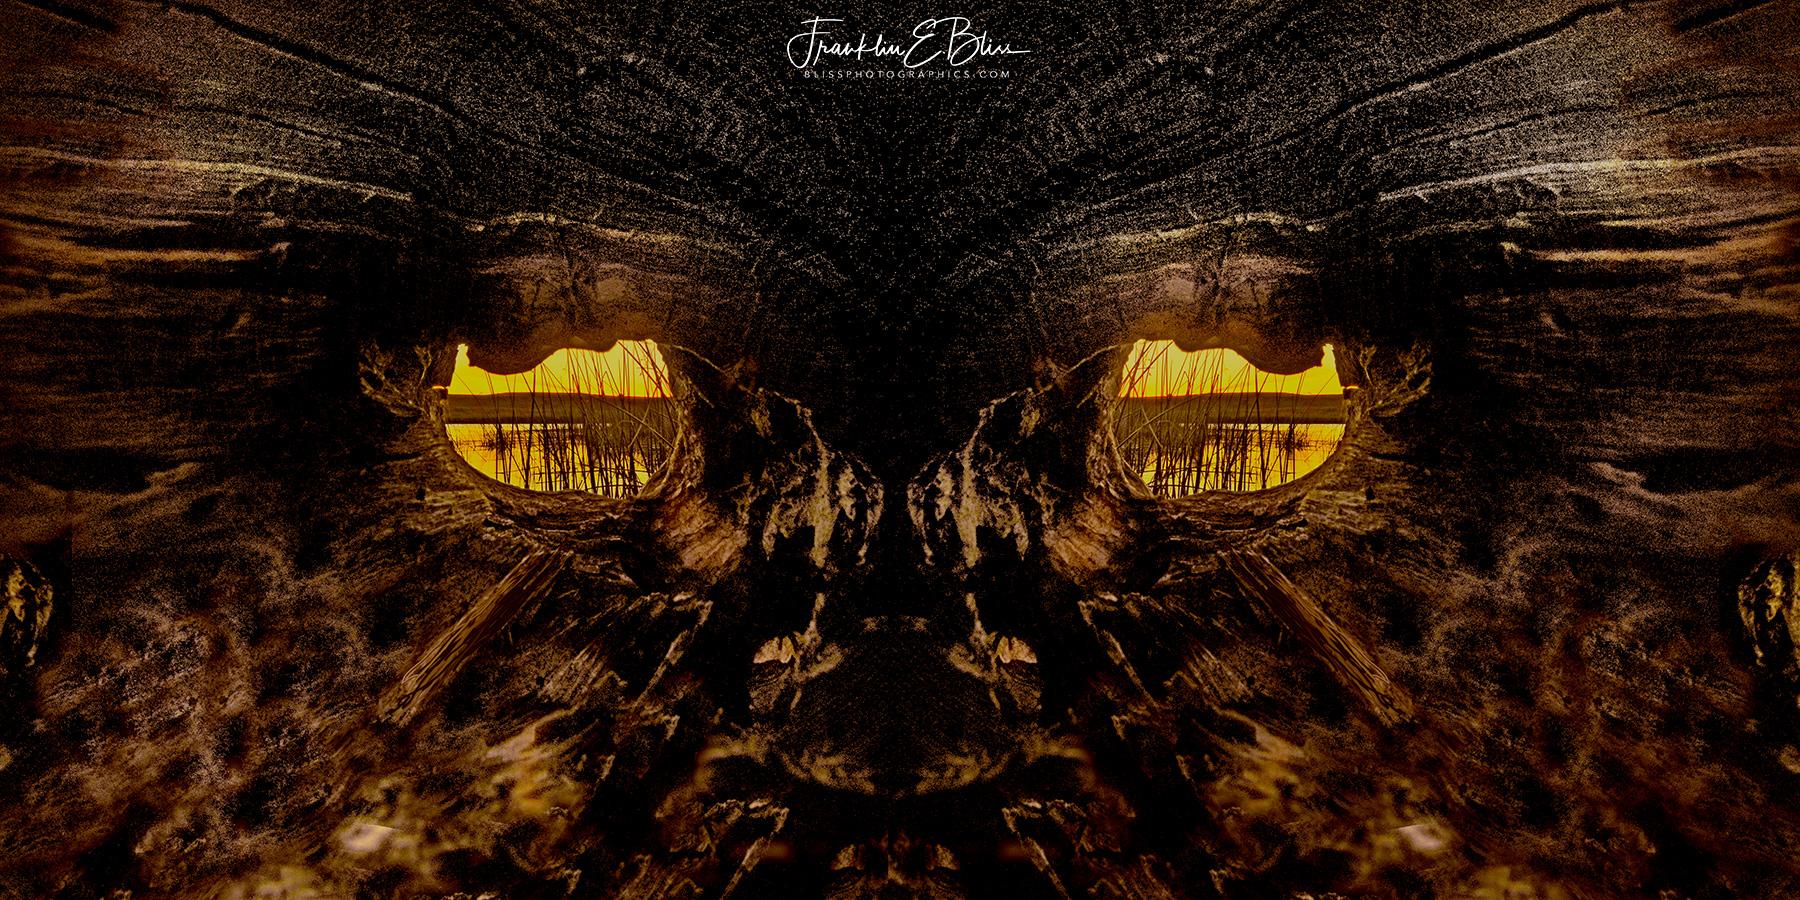 Sunrise Through the Knot Hole Mask (ART)